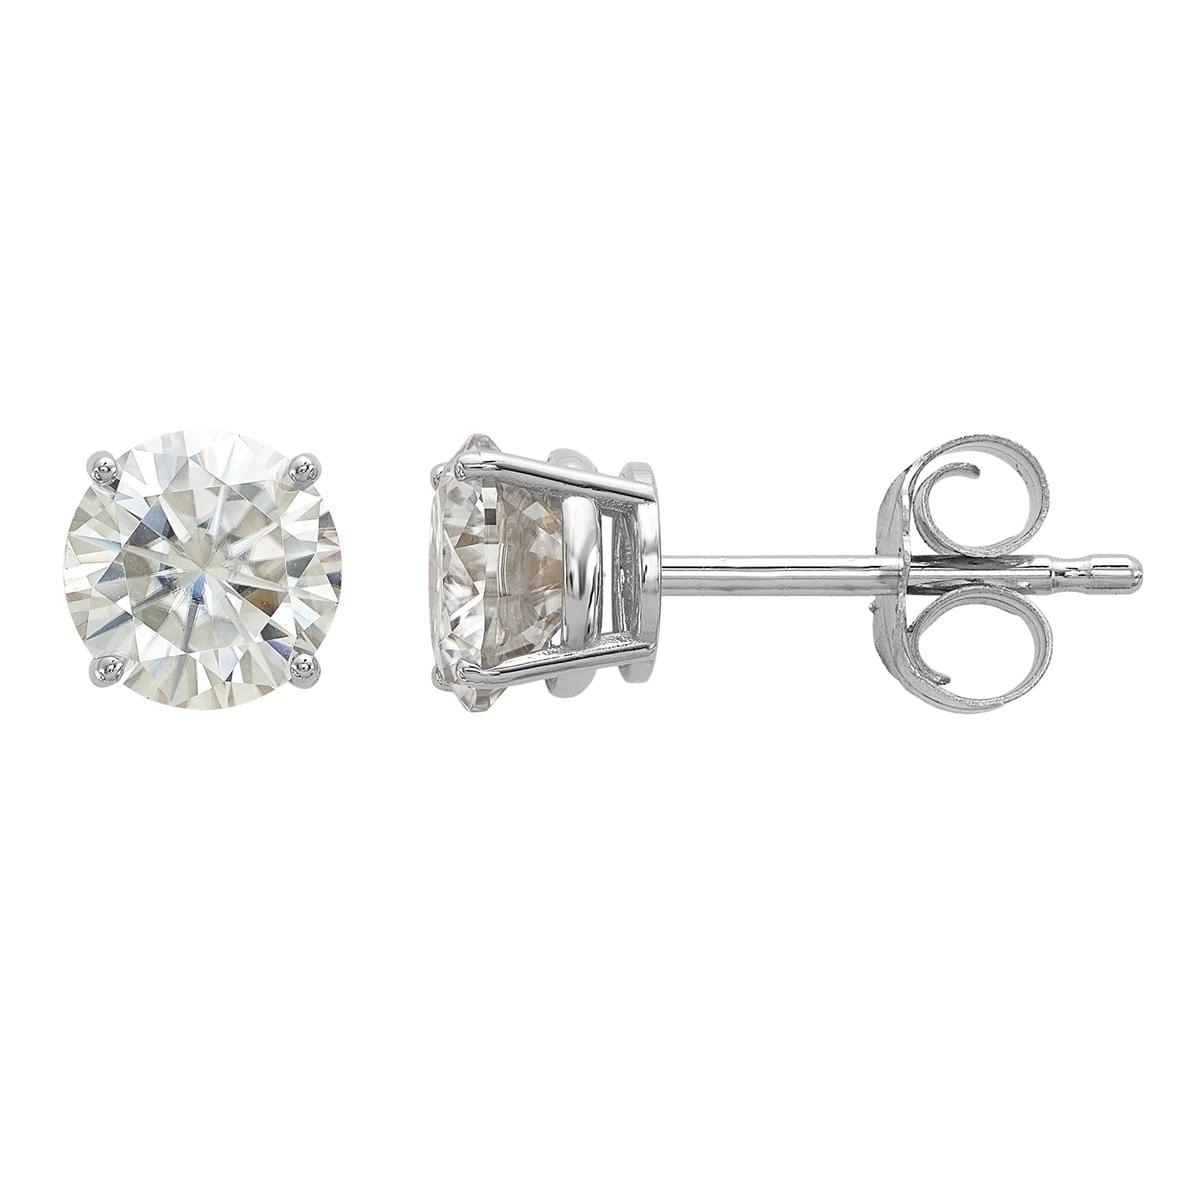 ca82c125b Shop Versil 14 Karat White Gold 5.0 mm Round True Light Moissanite 4-Prong  Basket Post Earrings - On Sale - Free Shipping Today - Overstock - 19212921